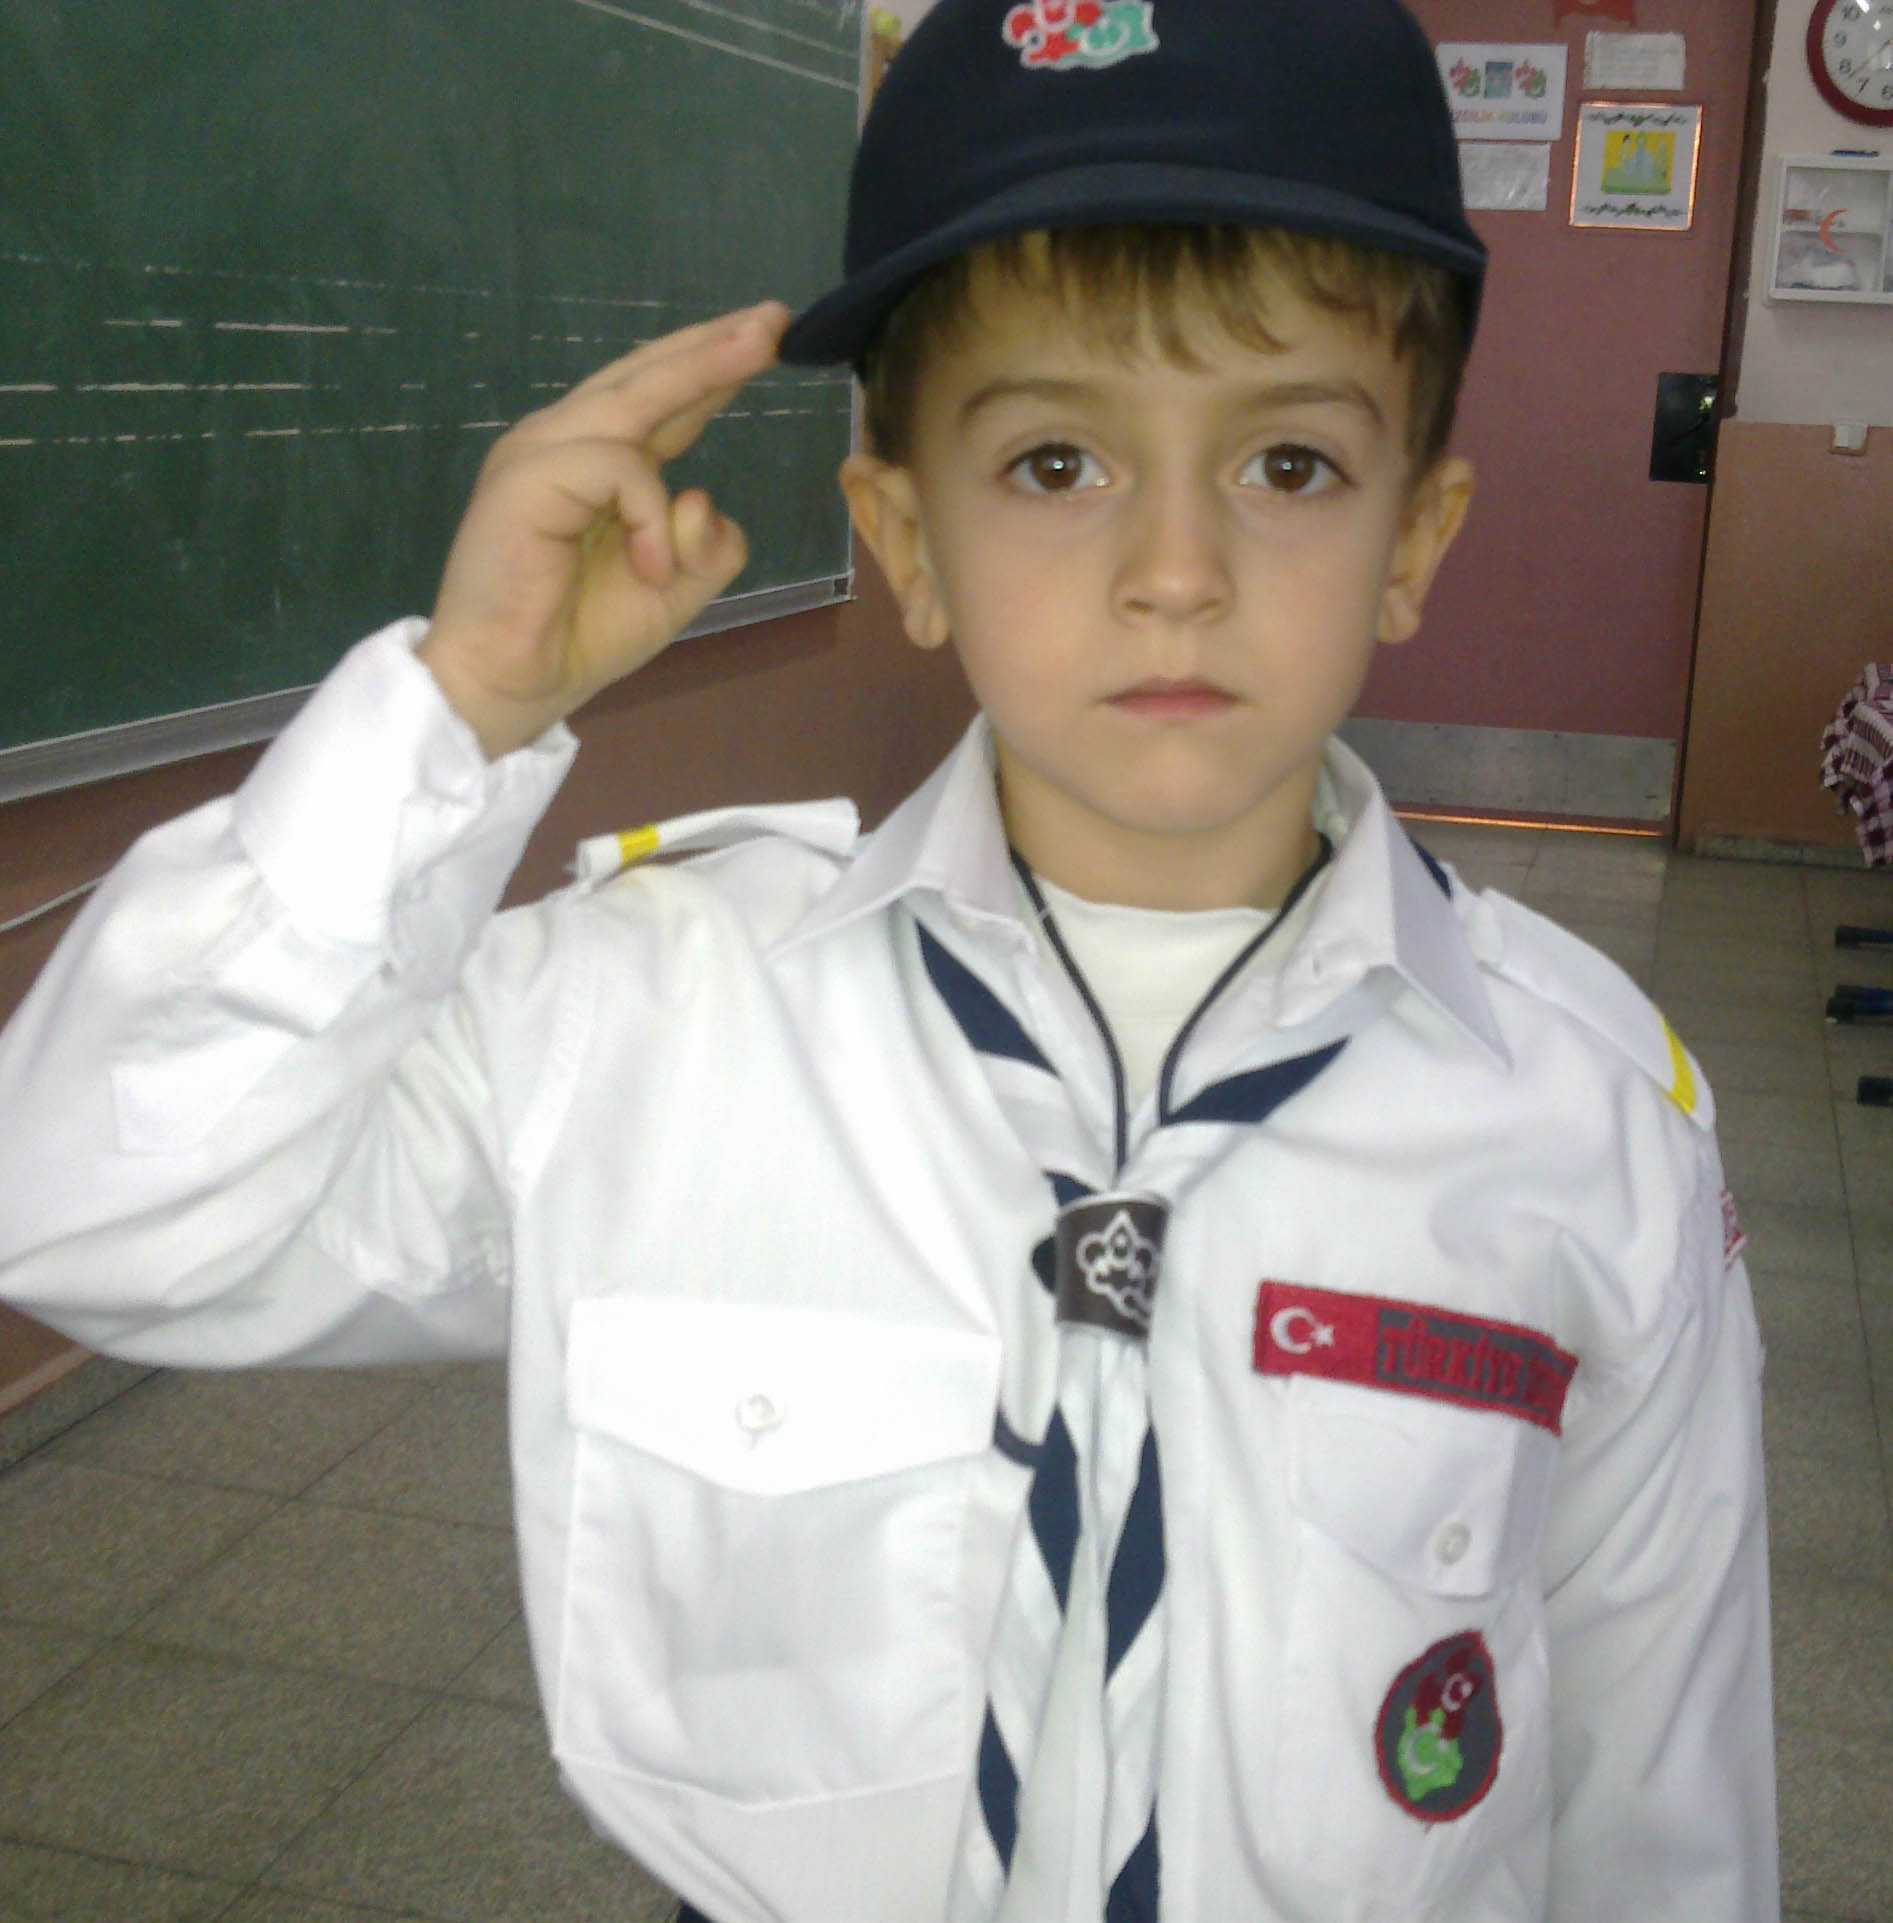 AHMET BARAN VARYEMEZ